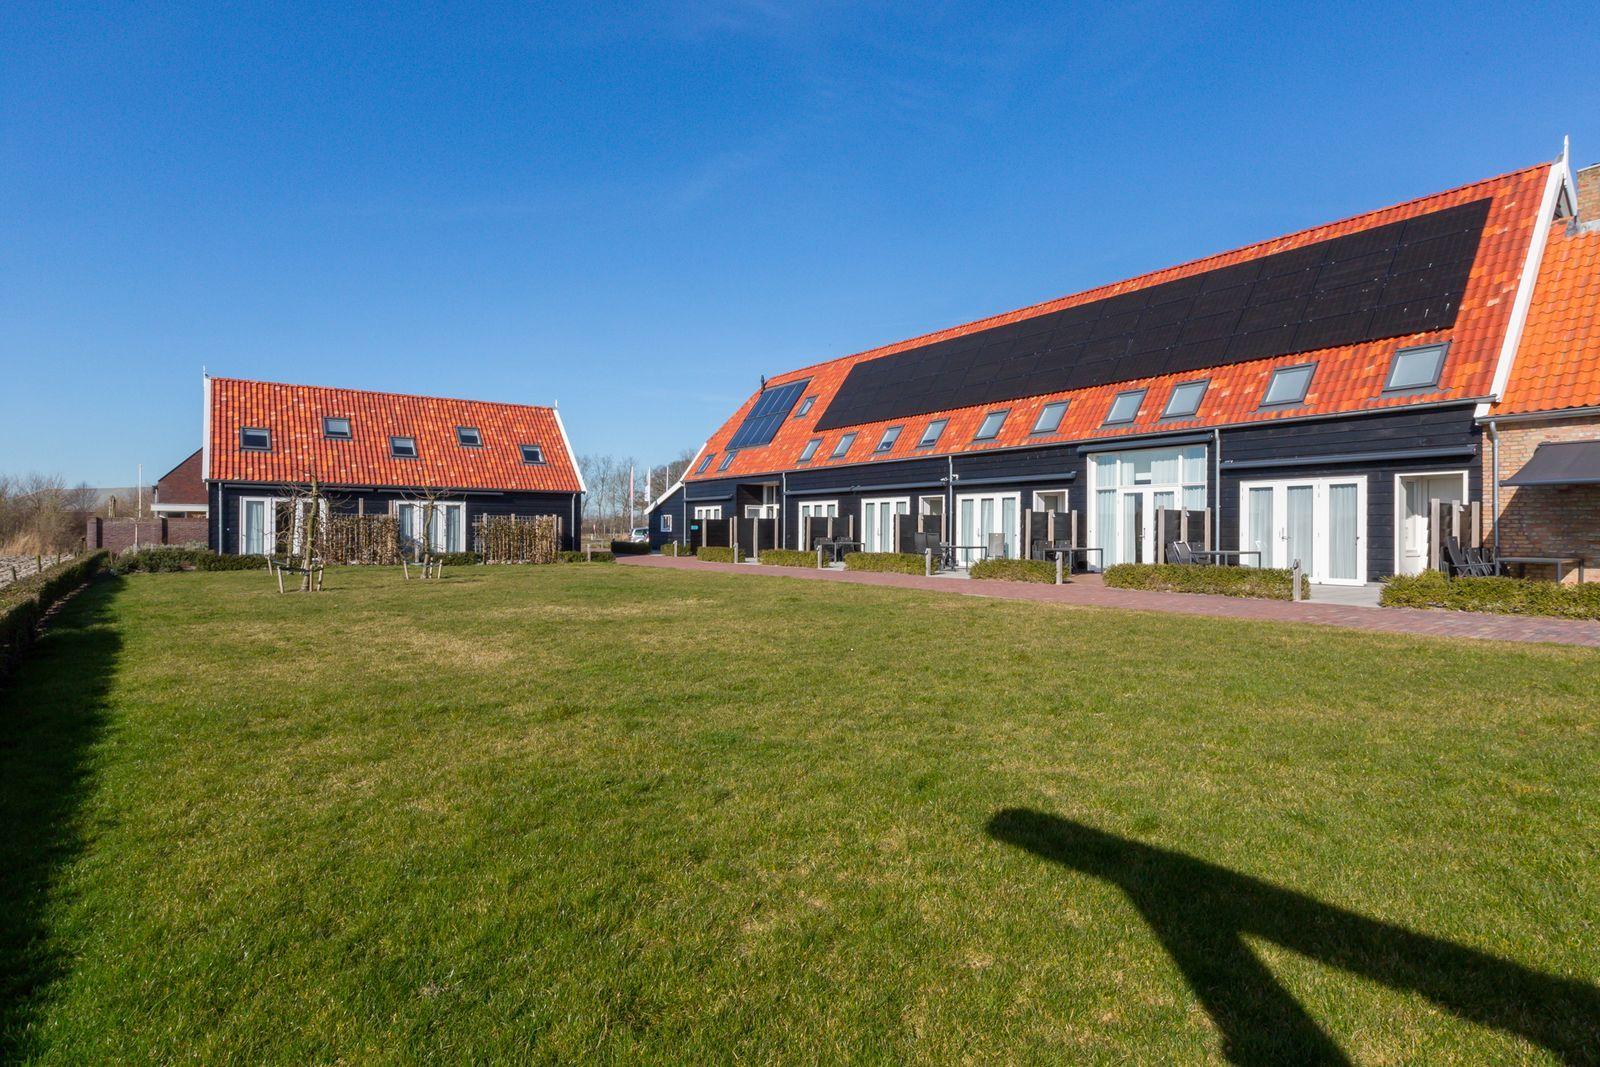 Holidayhome - Noordweg 56a | Oostkapelle